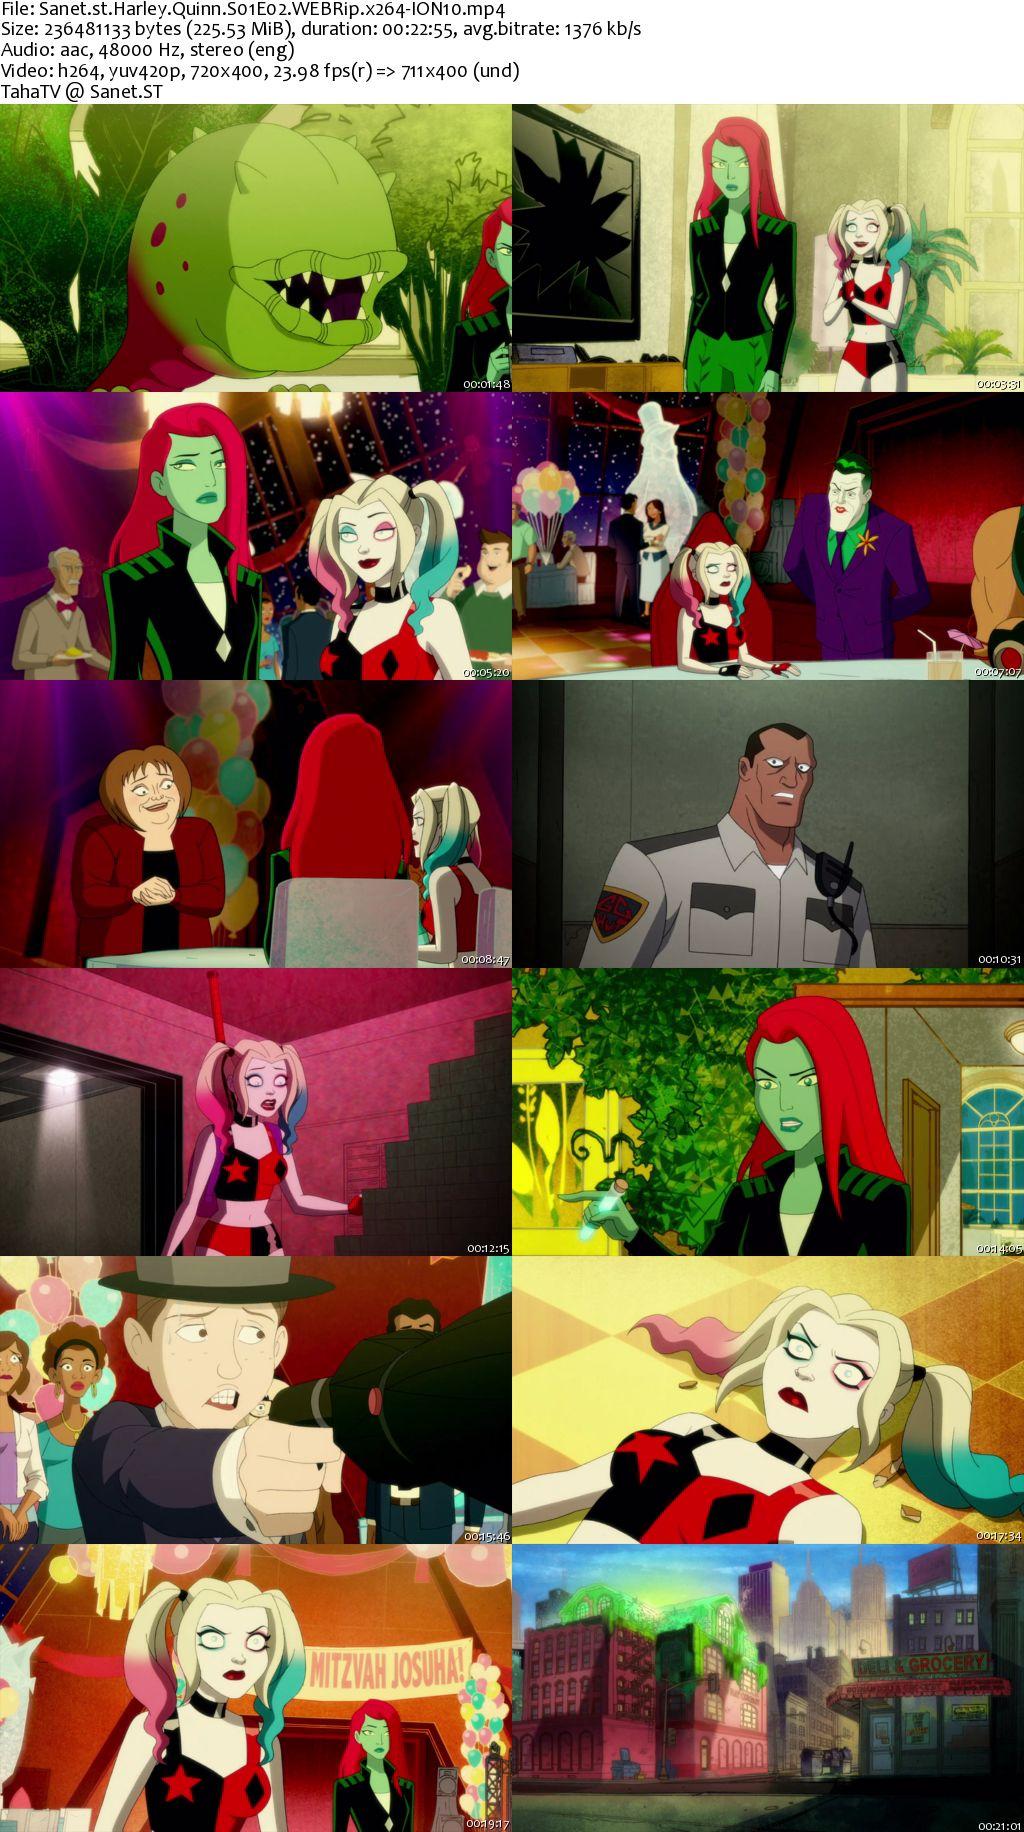 Download Harley Quinn S01 720p x265-MeGusta - SoftArchive